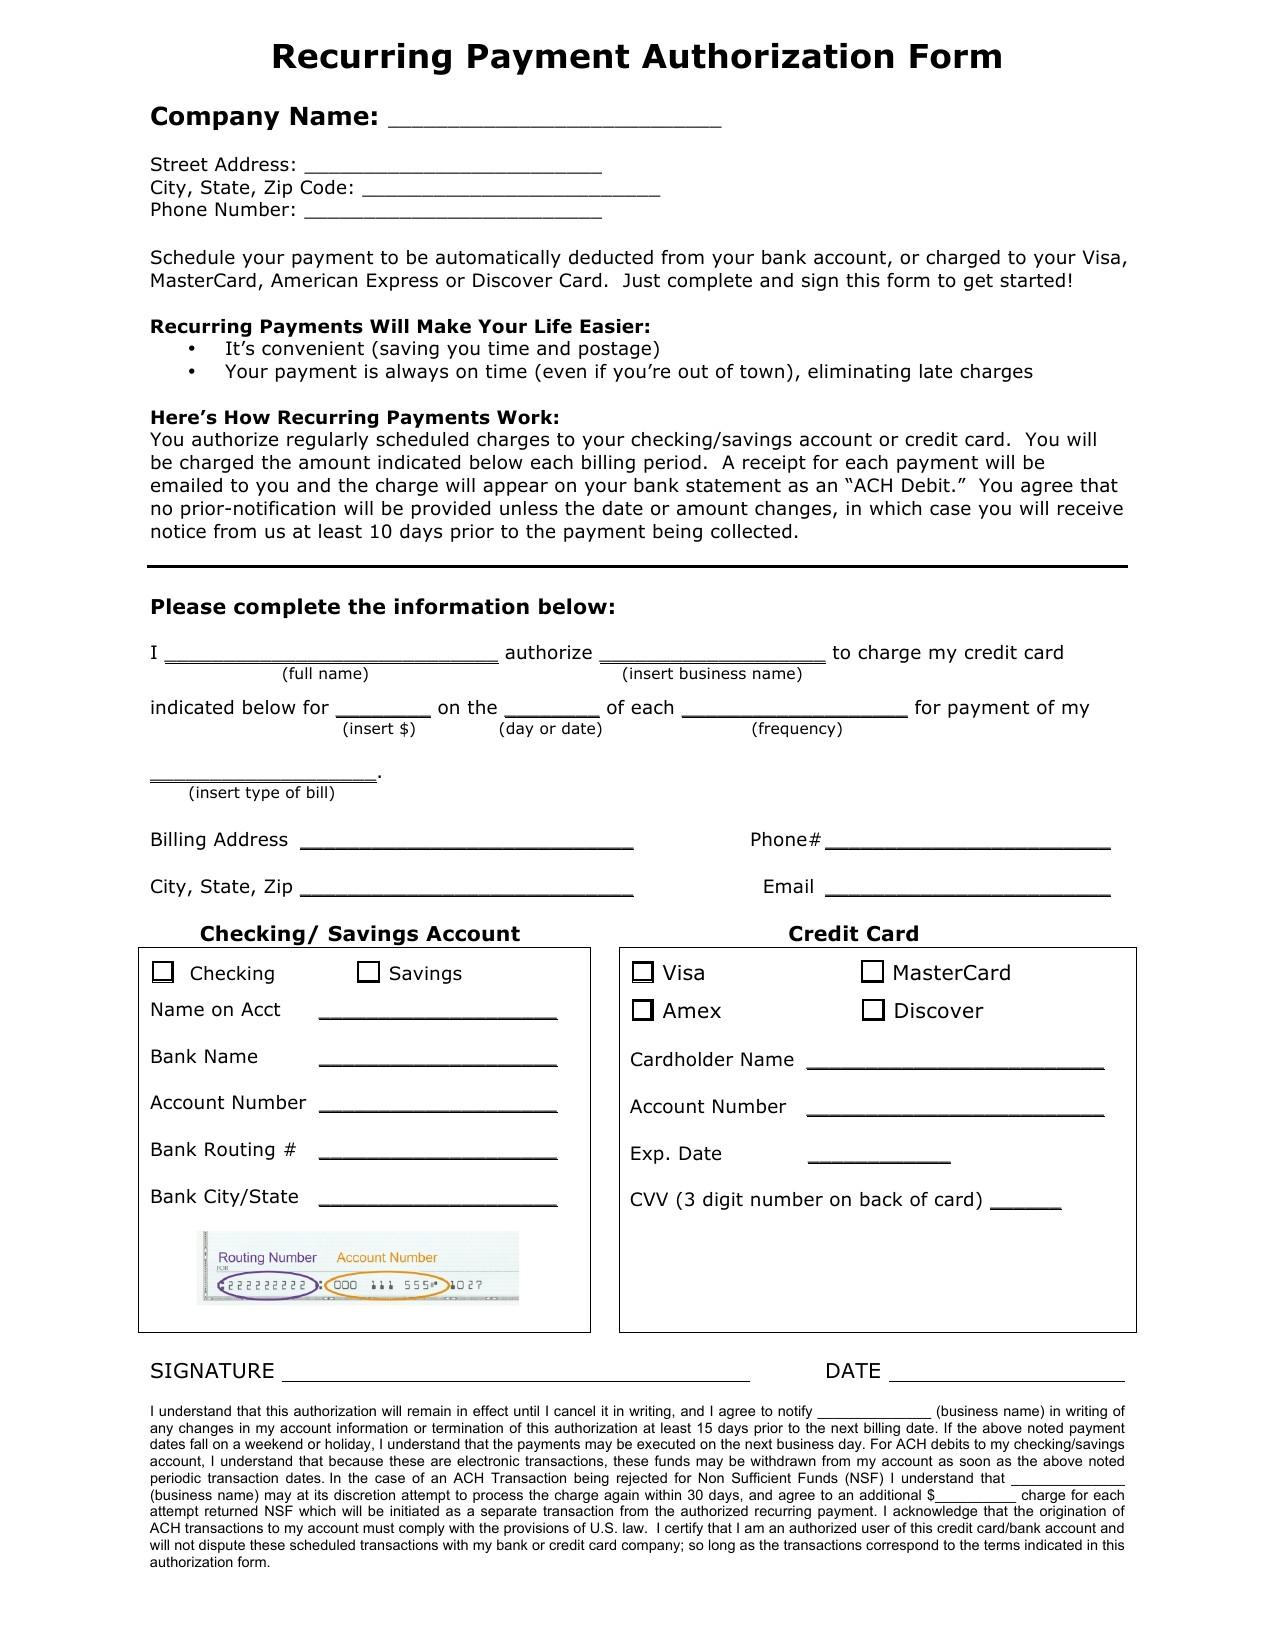 Ach Authorization Form Template Template Ach Debit Authorization Agreement Form